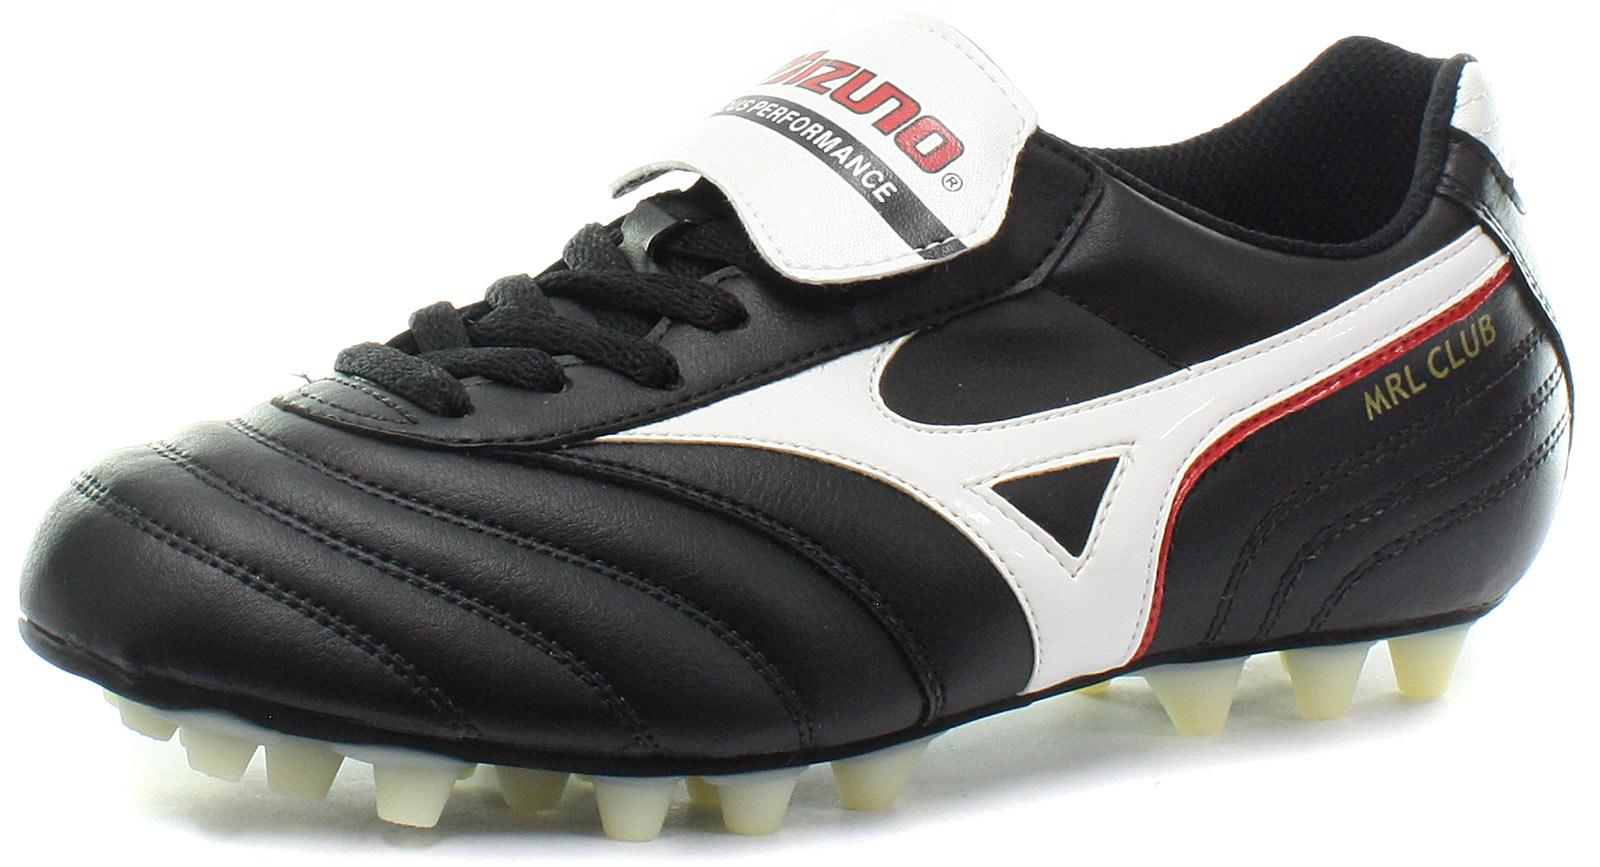 New-Mizuno-MRL-Morelia-Club-24-Mens-Football-Boots-ALL-SIZES-AND-COLOURS